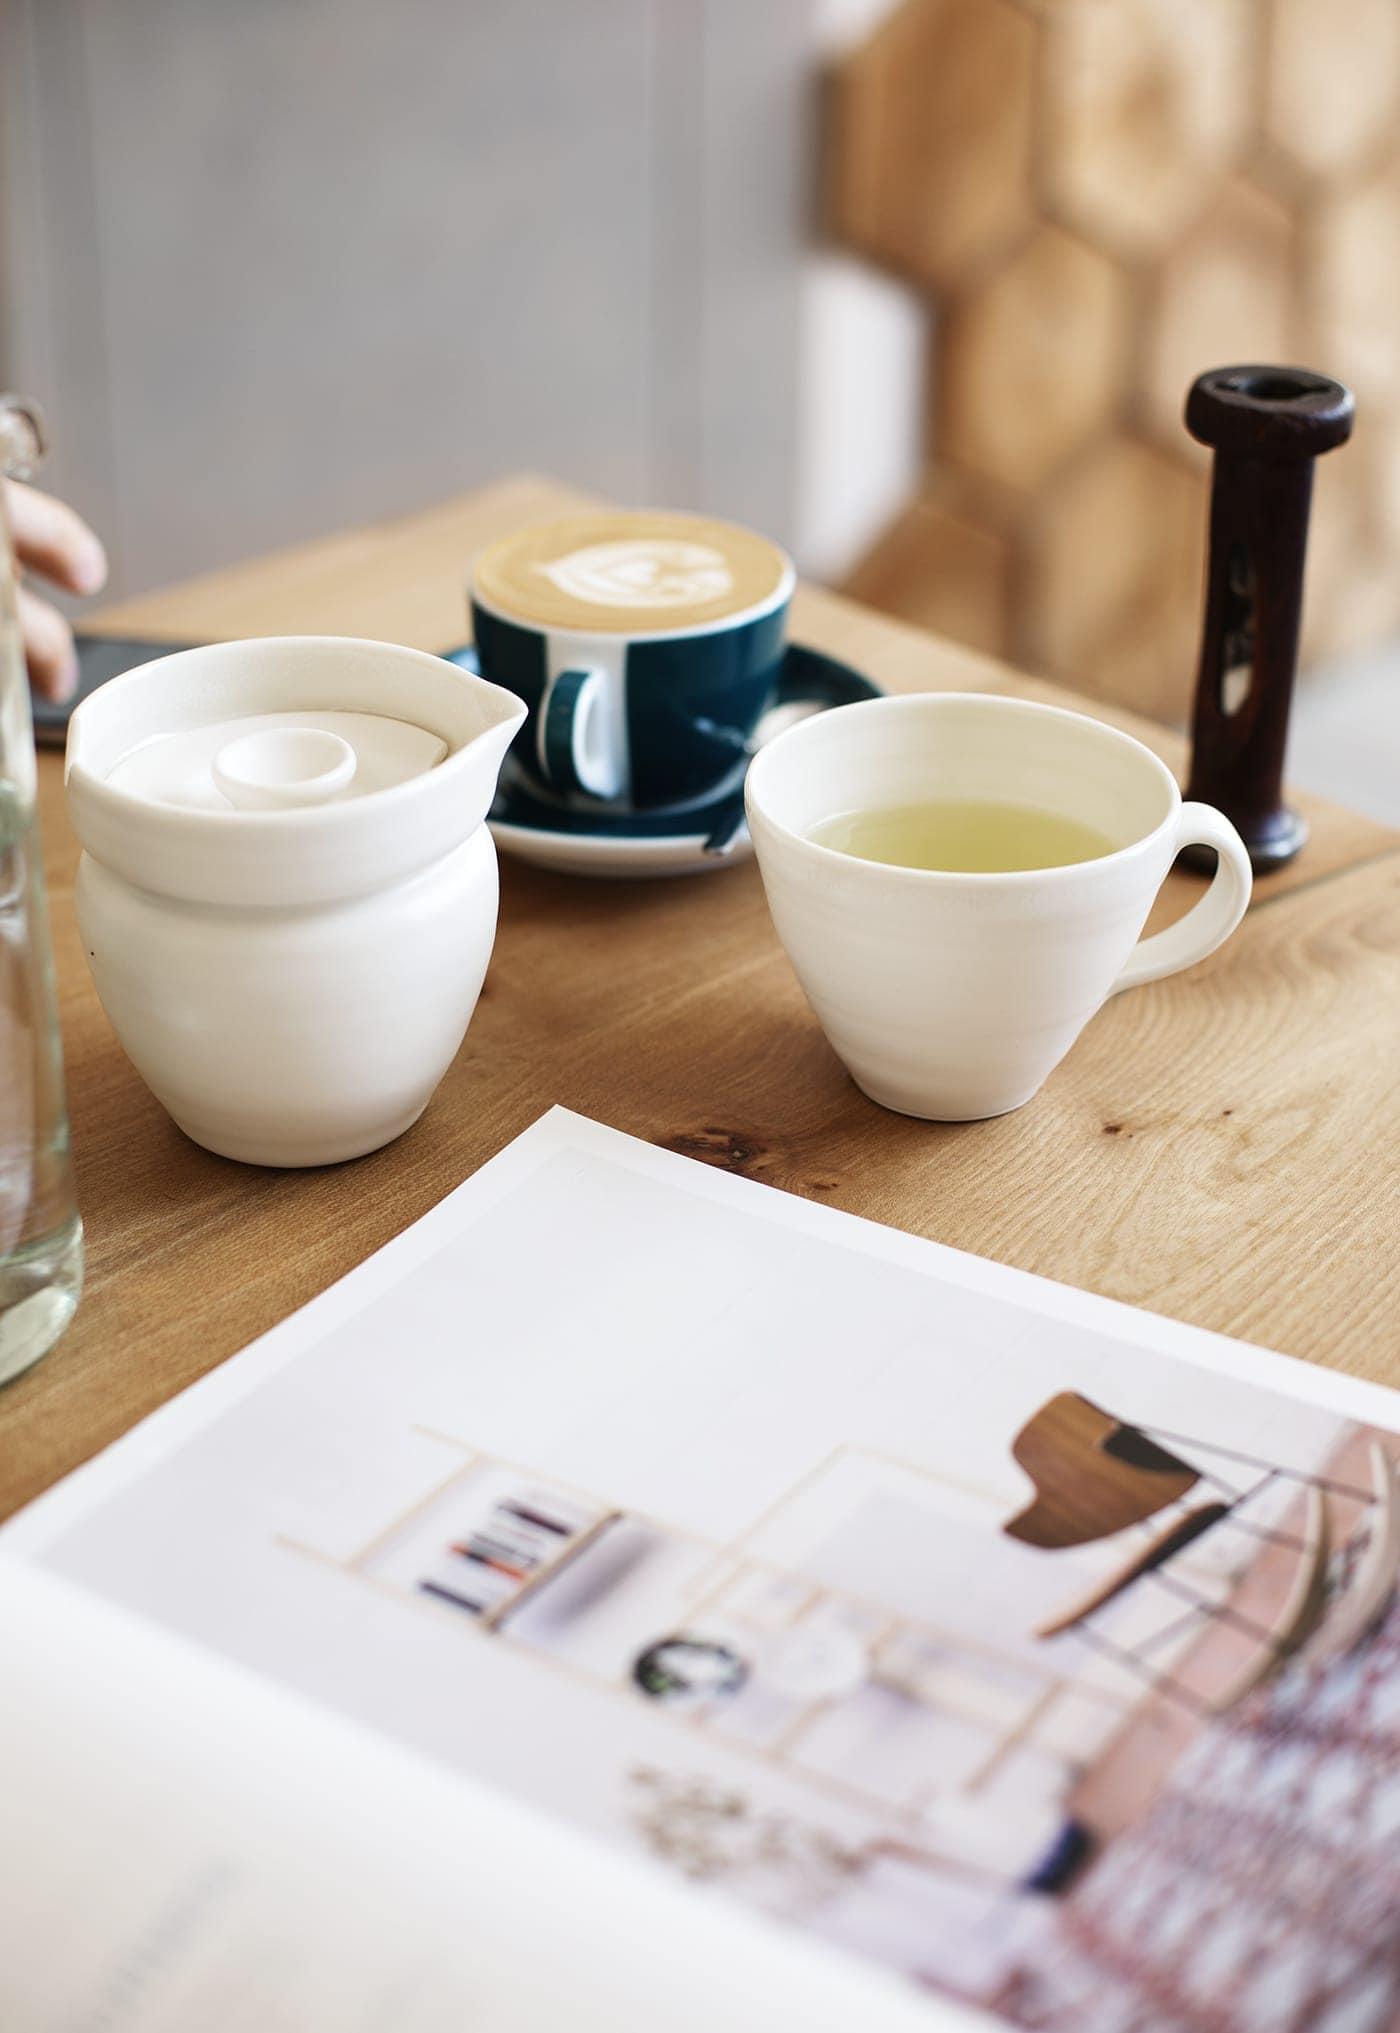 Clapham staycation | Story Coffee interiors 2 | mini break